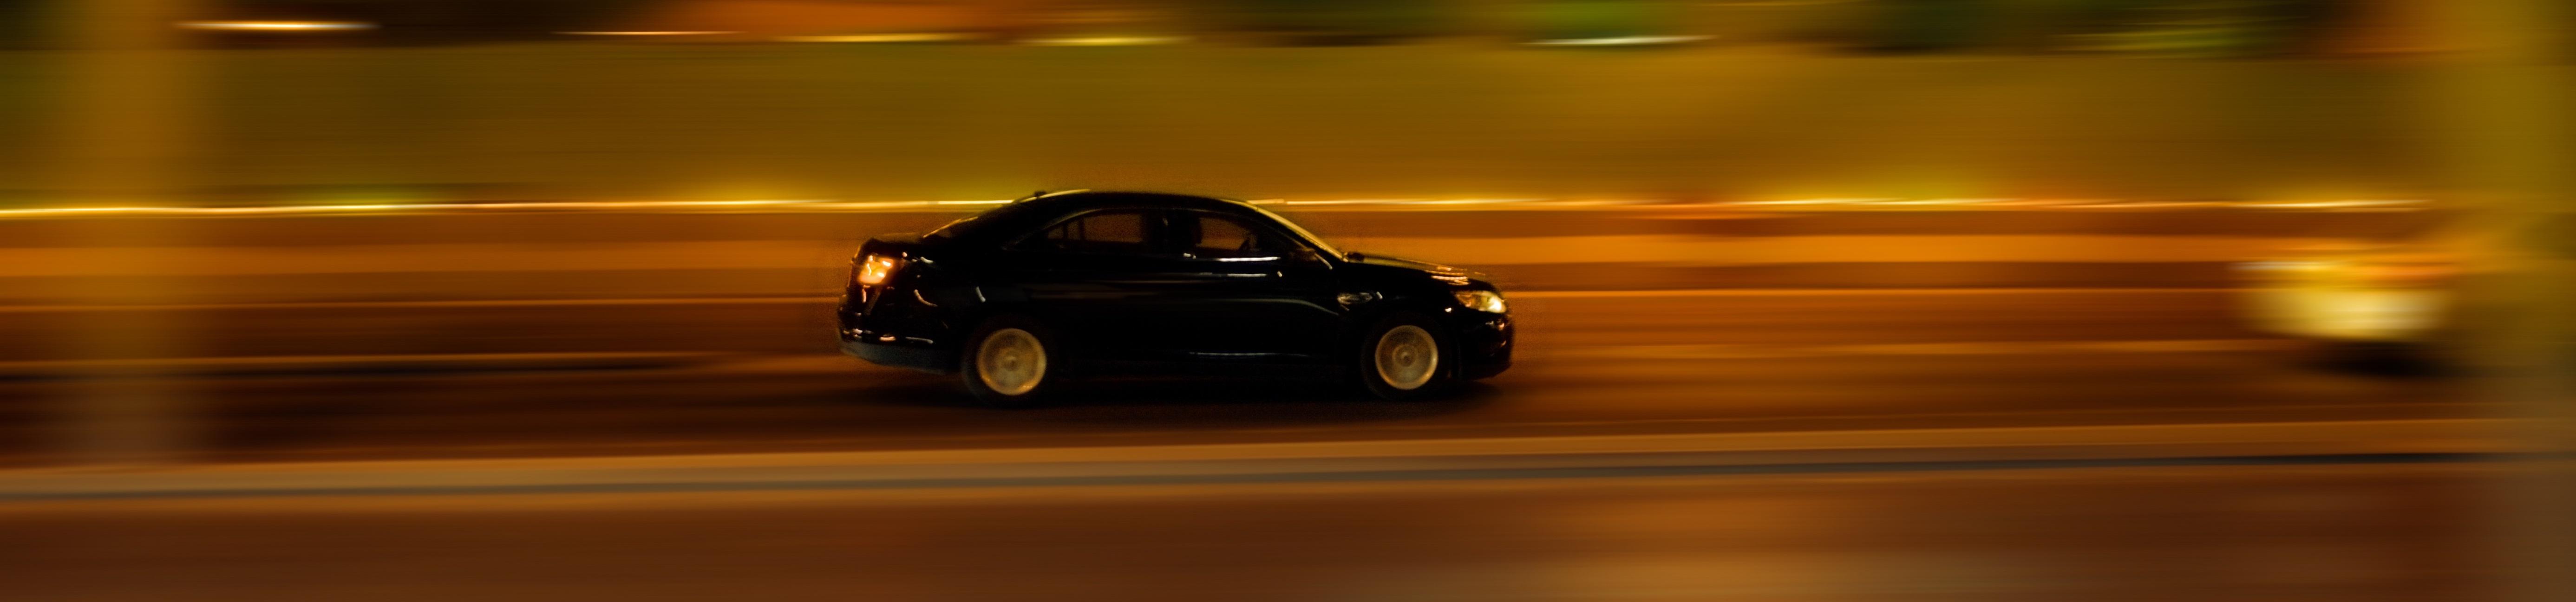 Discount Luxury Car Hire Brisbane Airport